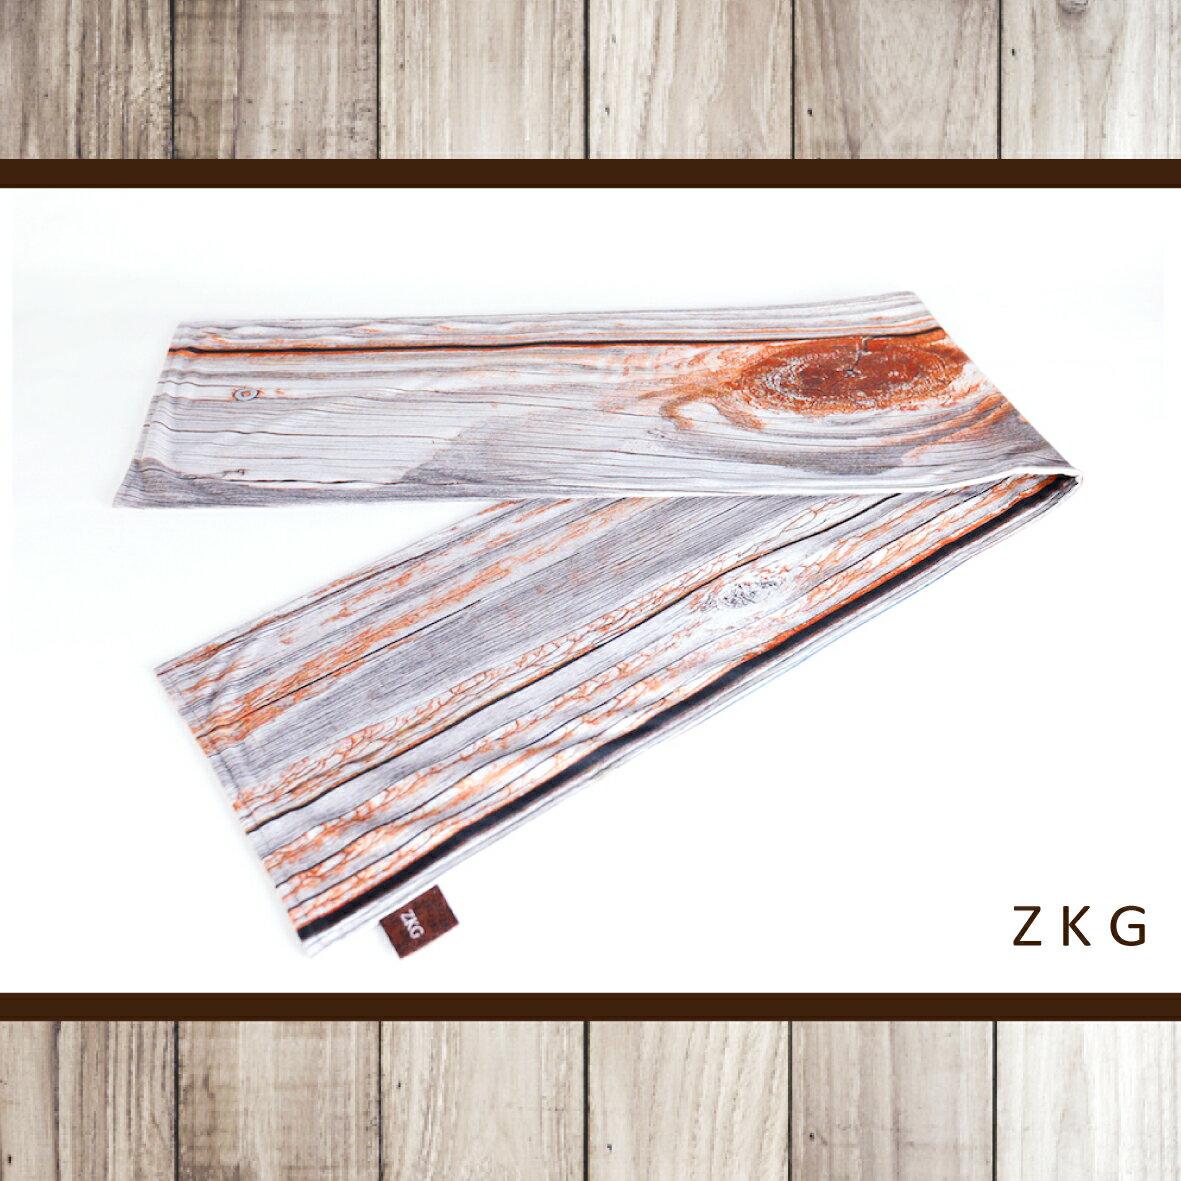 <br/><br/>  ZKG 木系列-圍巾-單個入 台灣(手工製)*送禮*自用*<br/><br/>